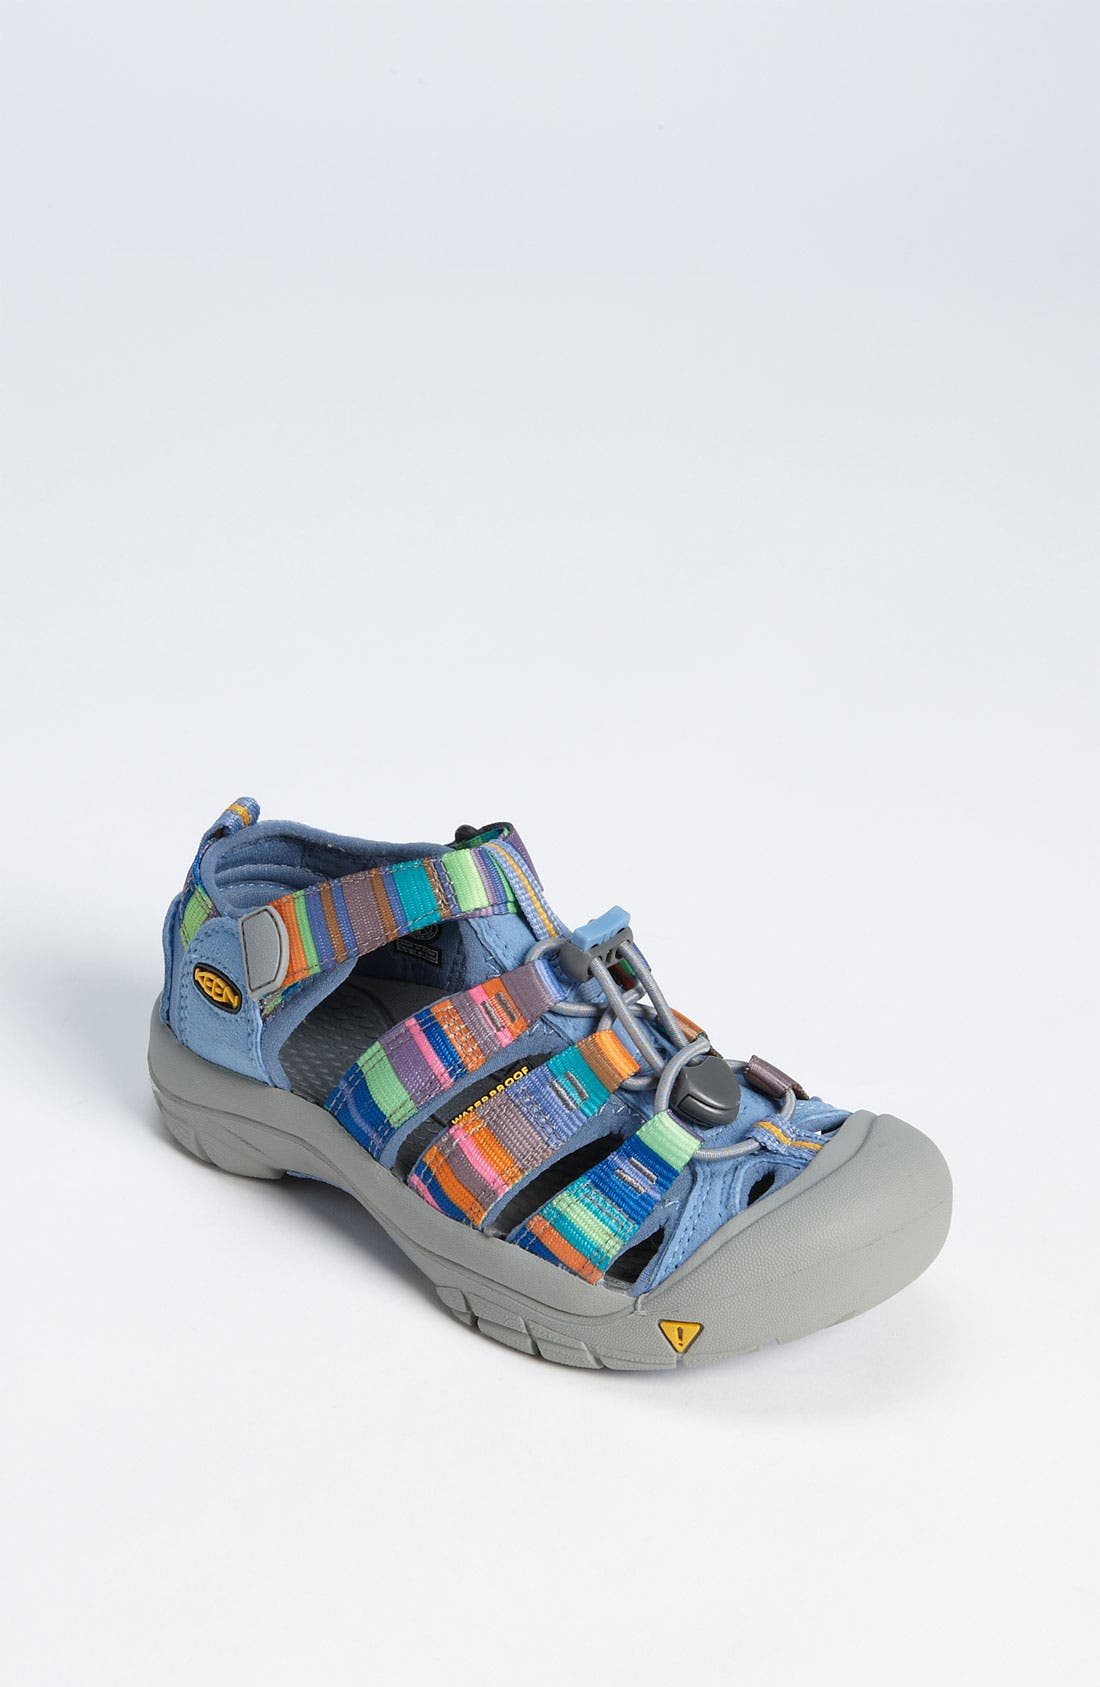 Main Image - Keen 'Newport H2' Sandal (Toddler, Little Kid & Big Kid)